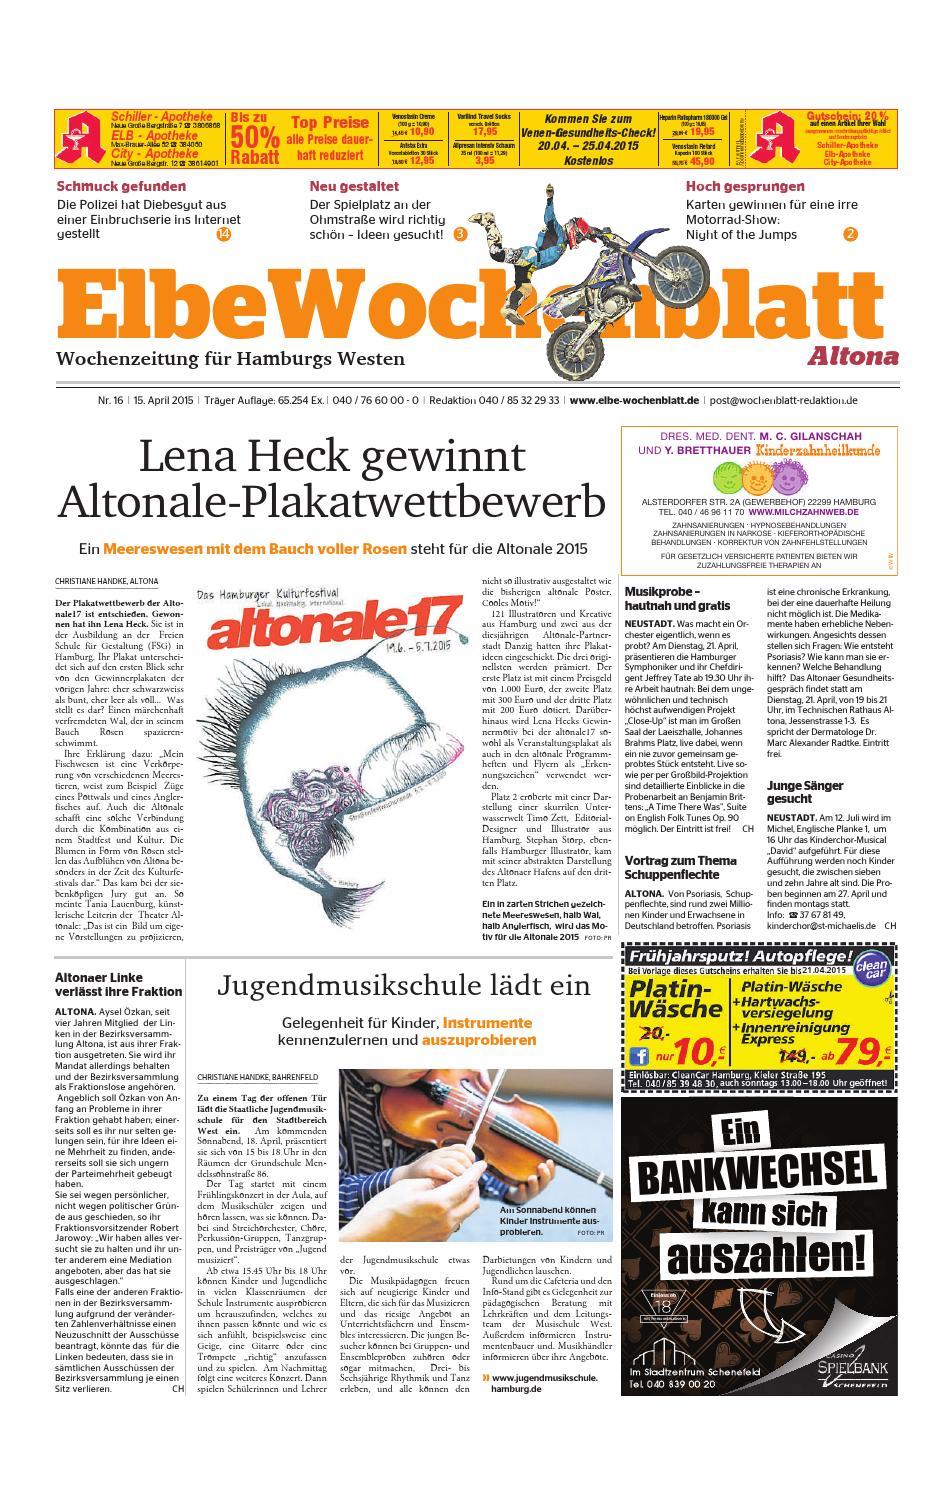 Altona KW16-2015 by Elbe Wochenblatt Verlagsgesellschaft mbH & Co.KG - issuu